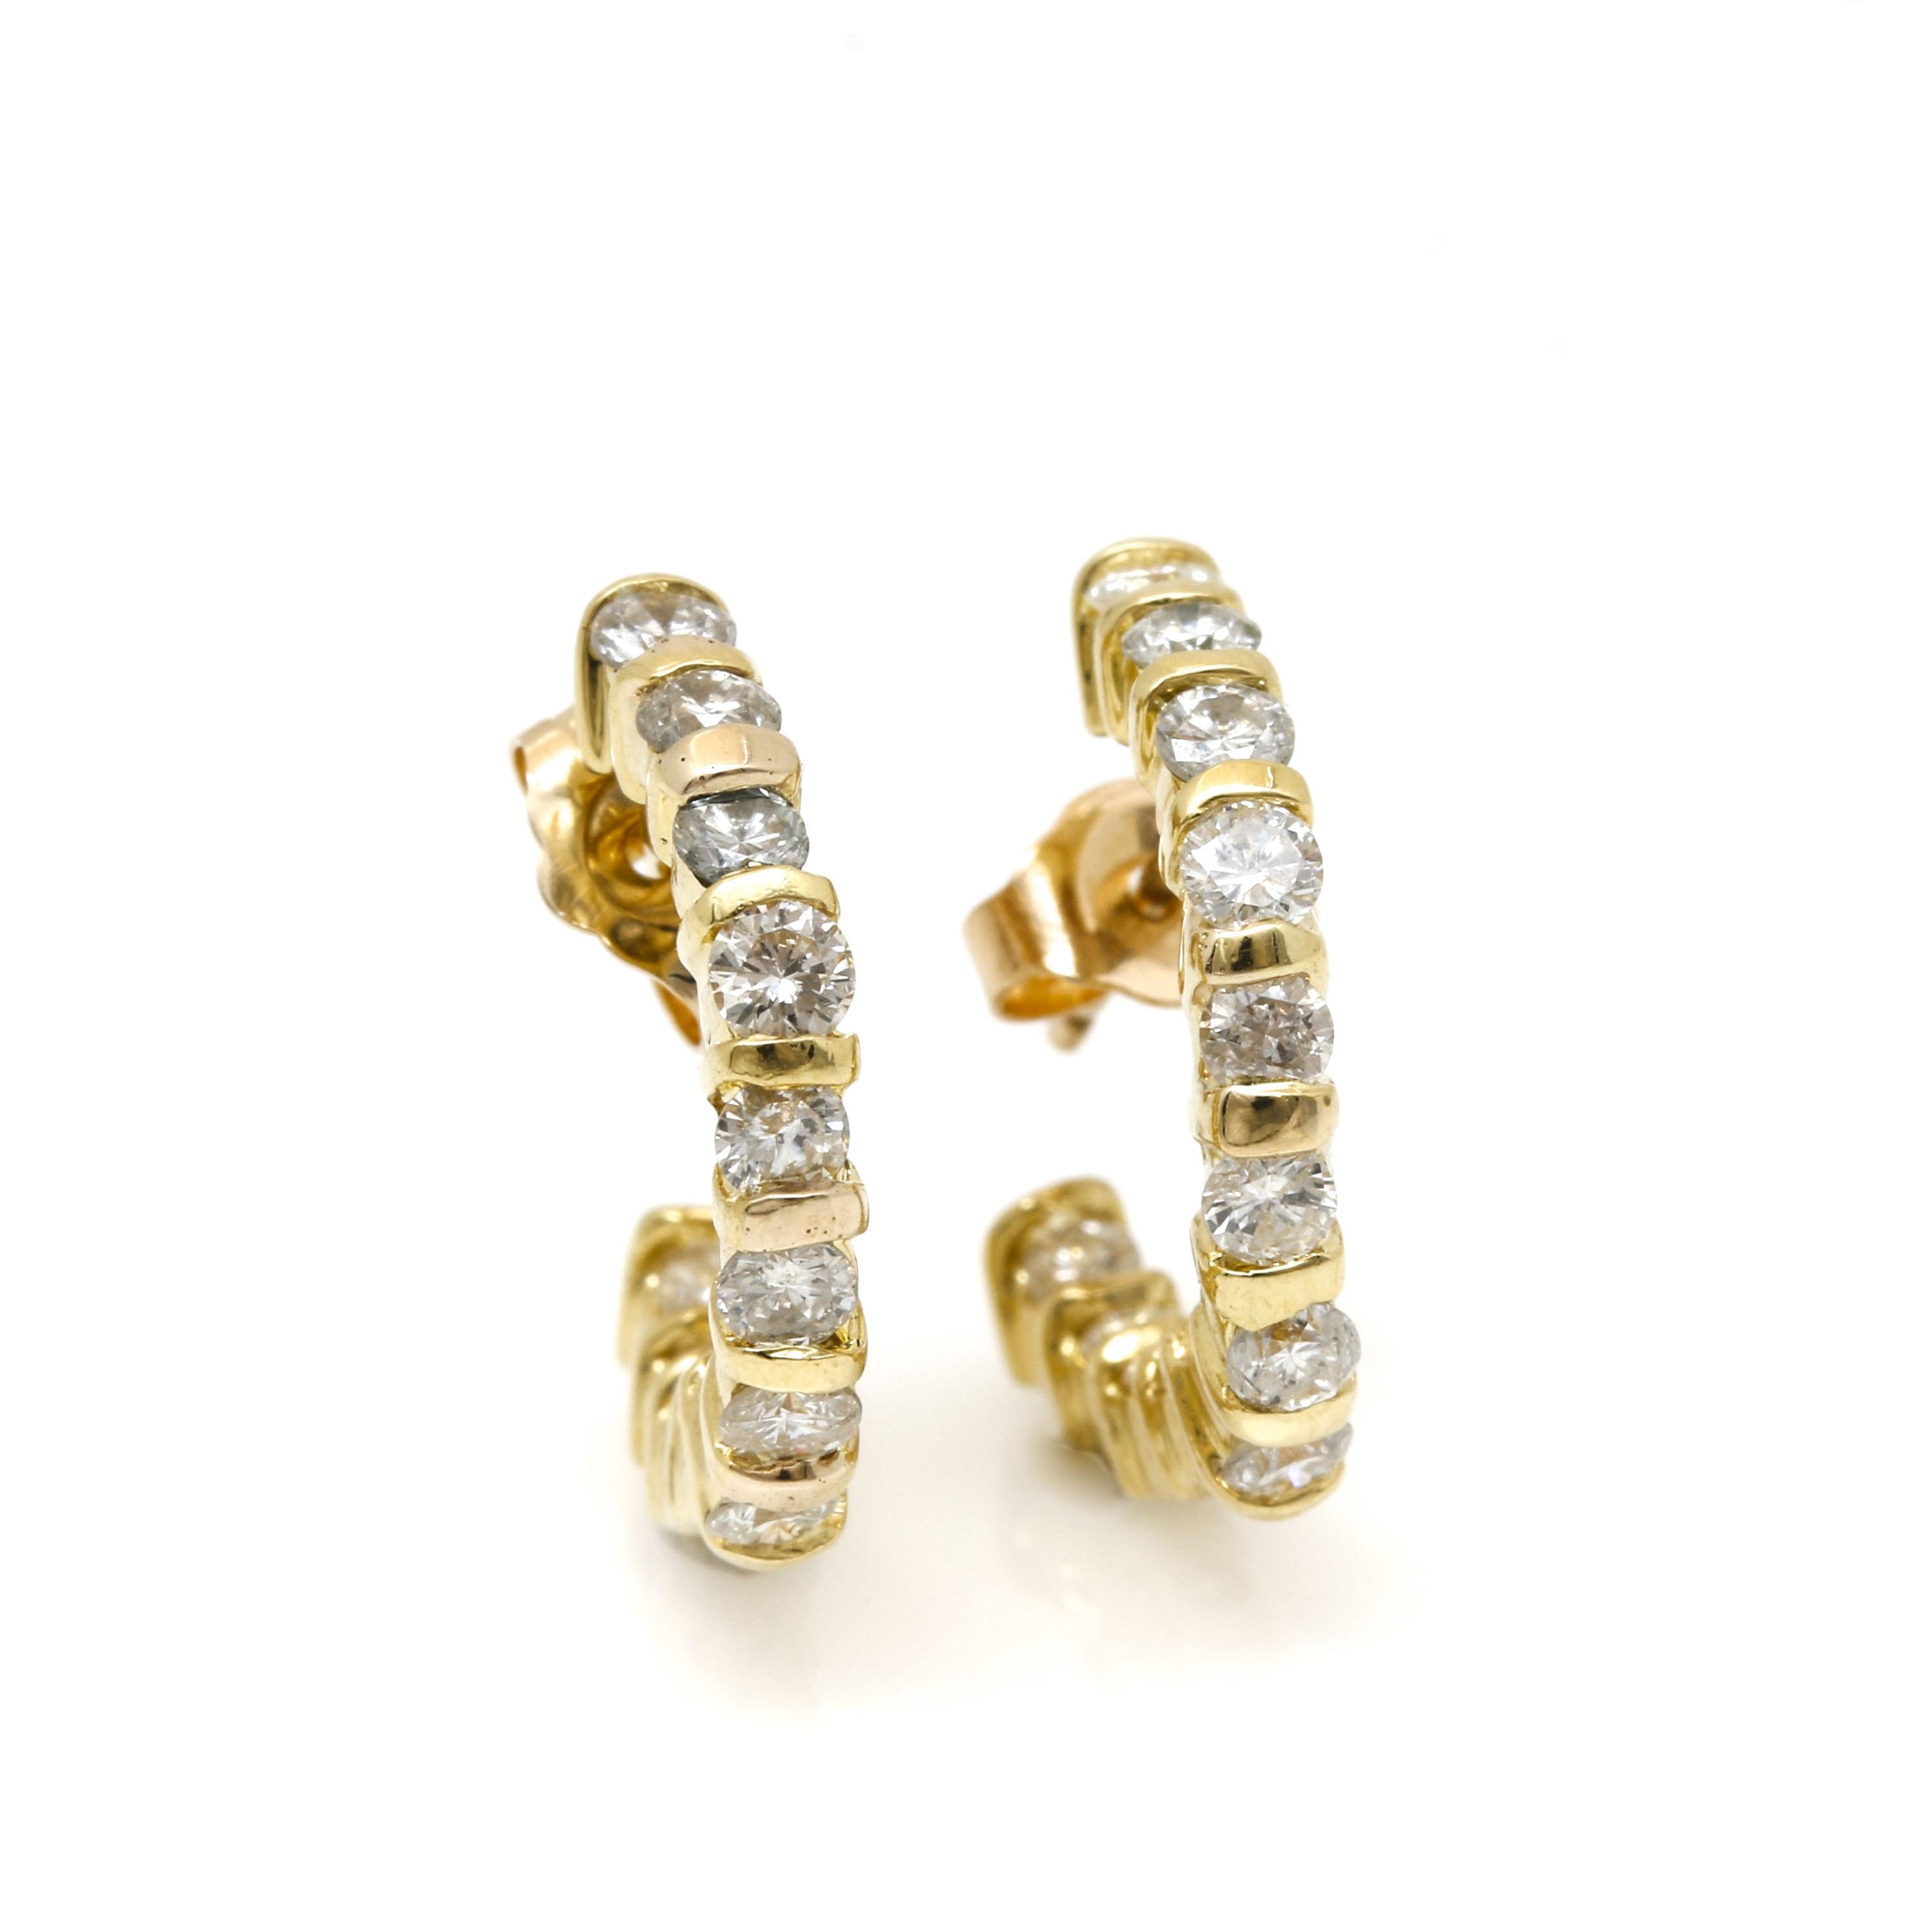 18K Yellow Gold 1.08 CTW Diamond Earrings